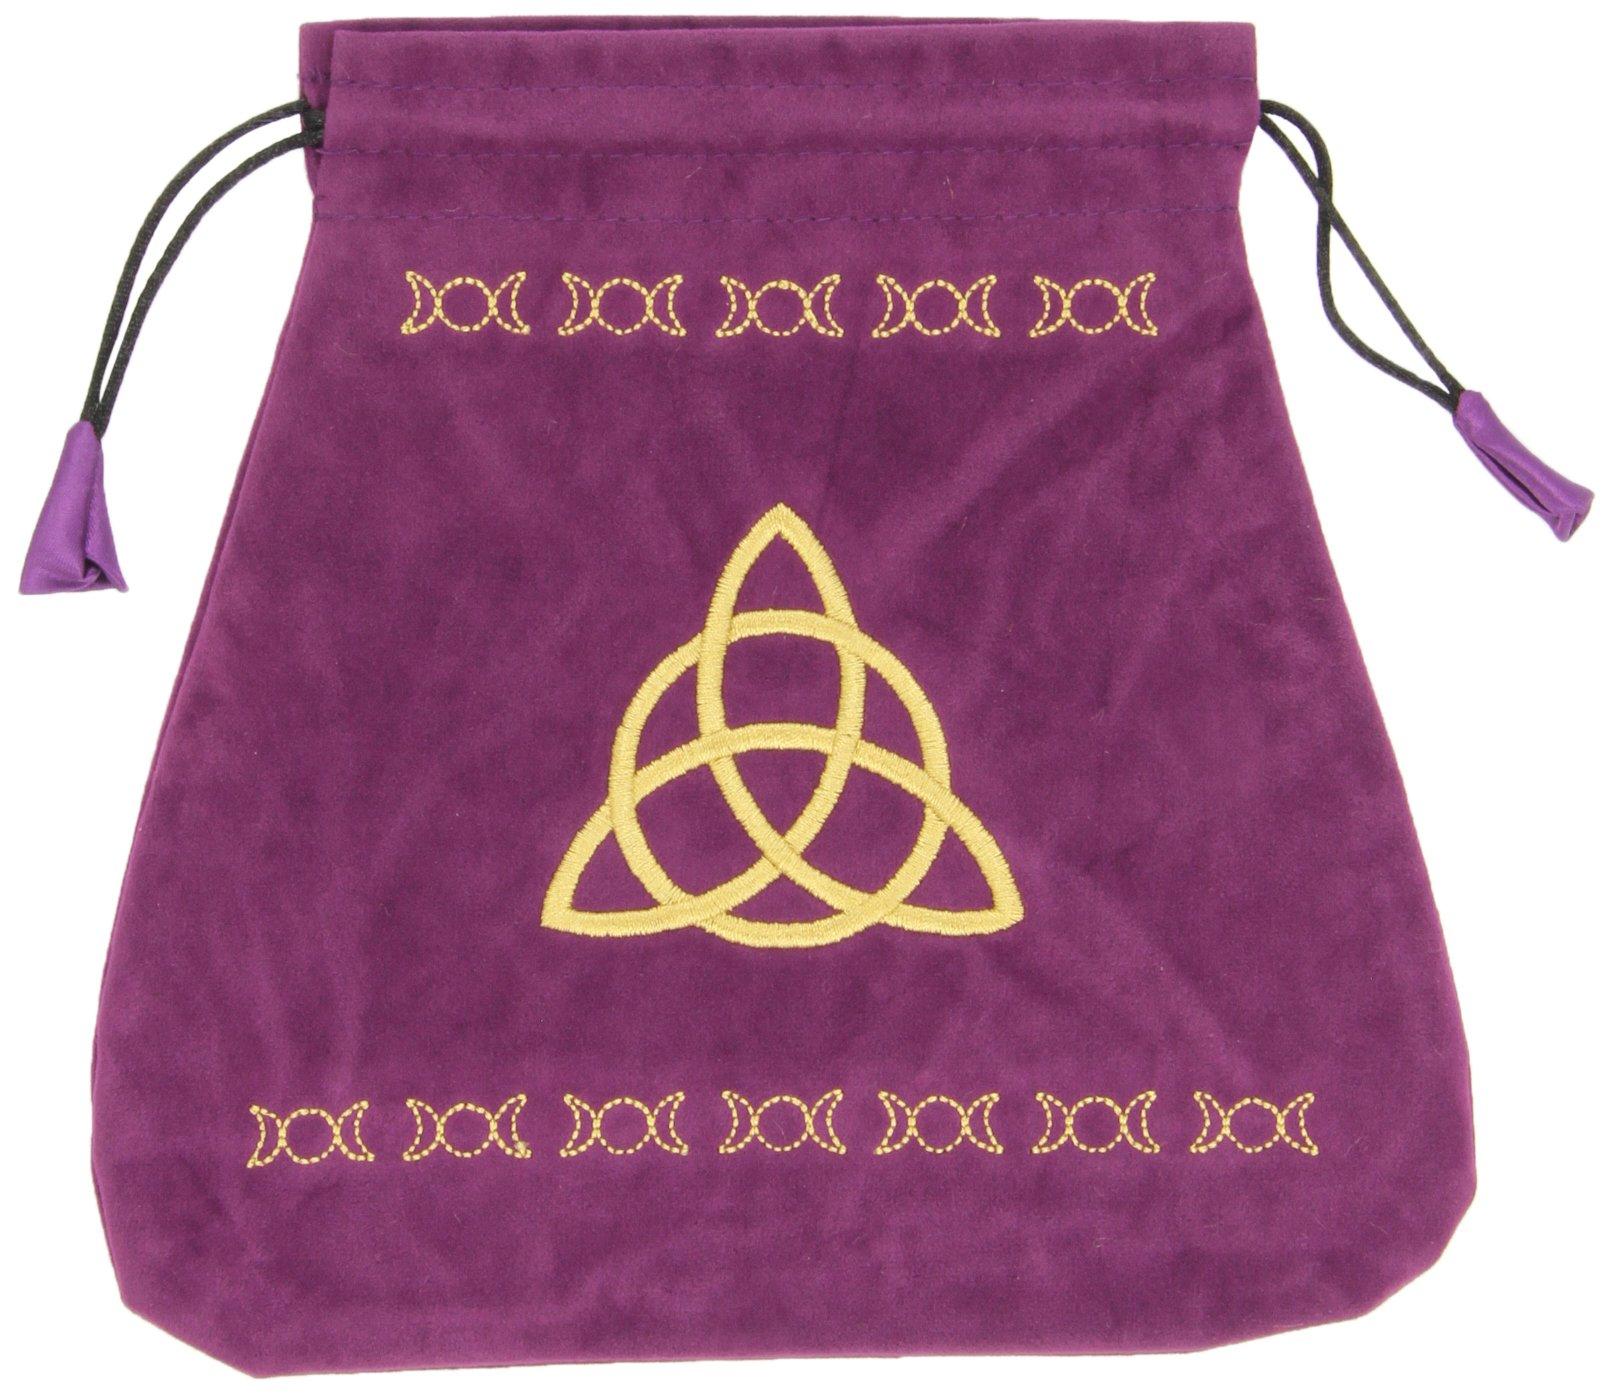 Triple Goddess Velvet Tarot Bag Bolsas de Lo Scarabeo Tarot ...